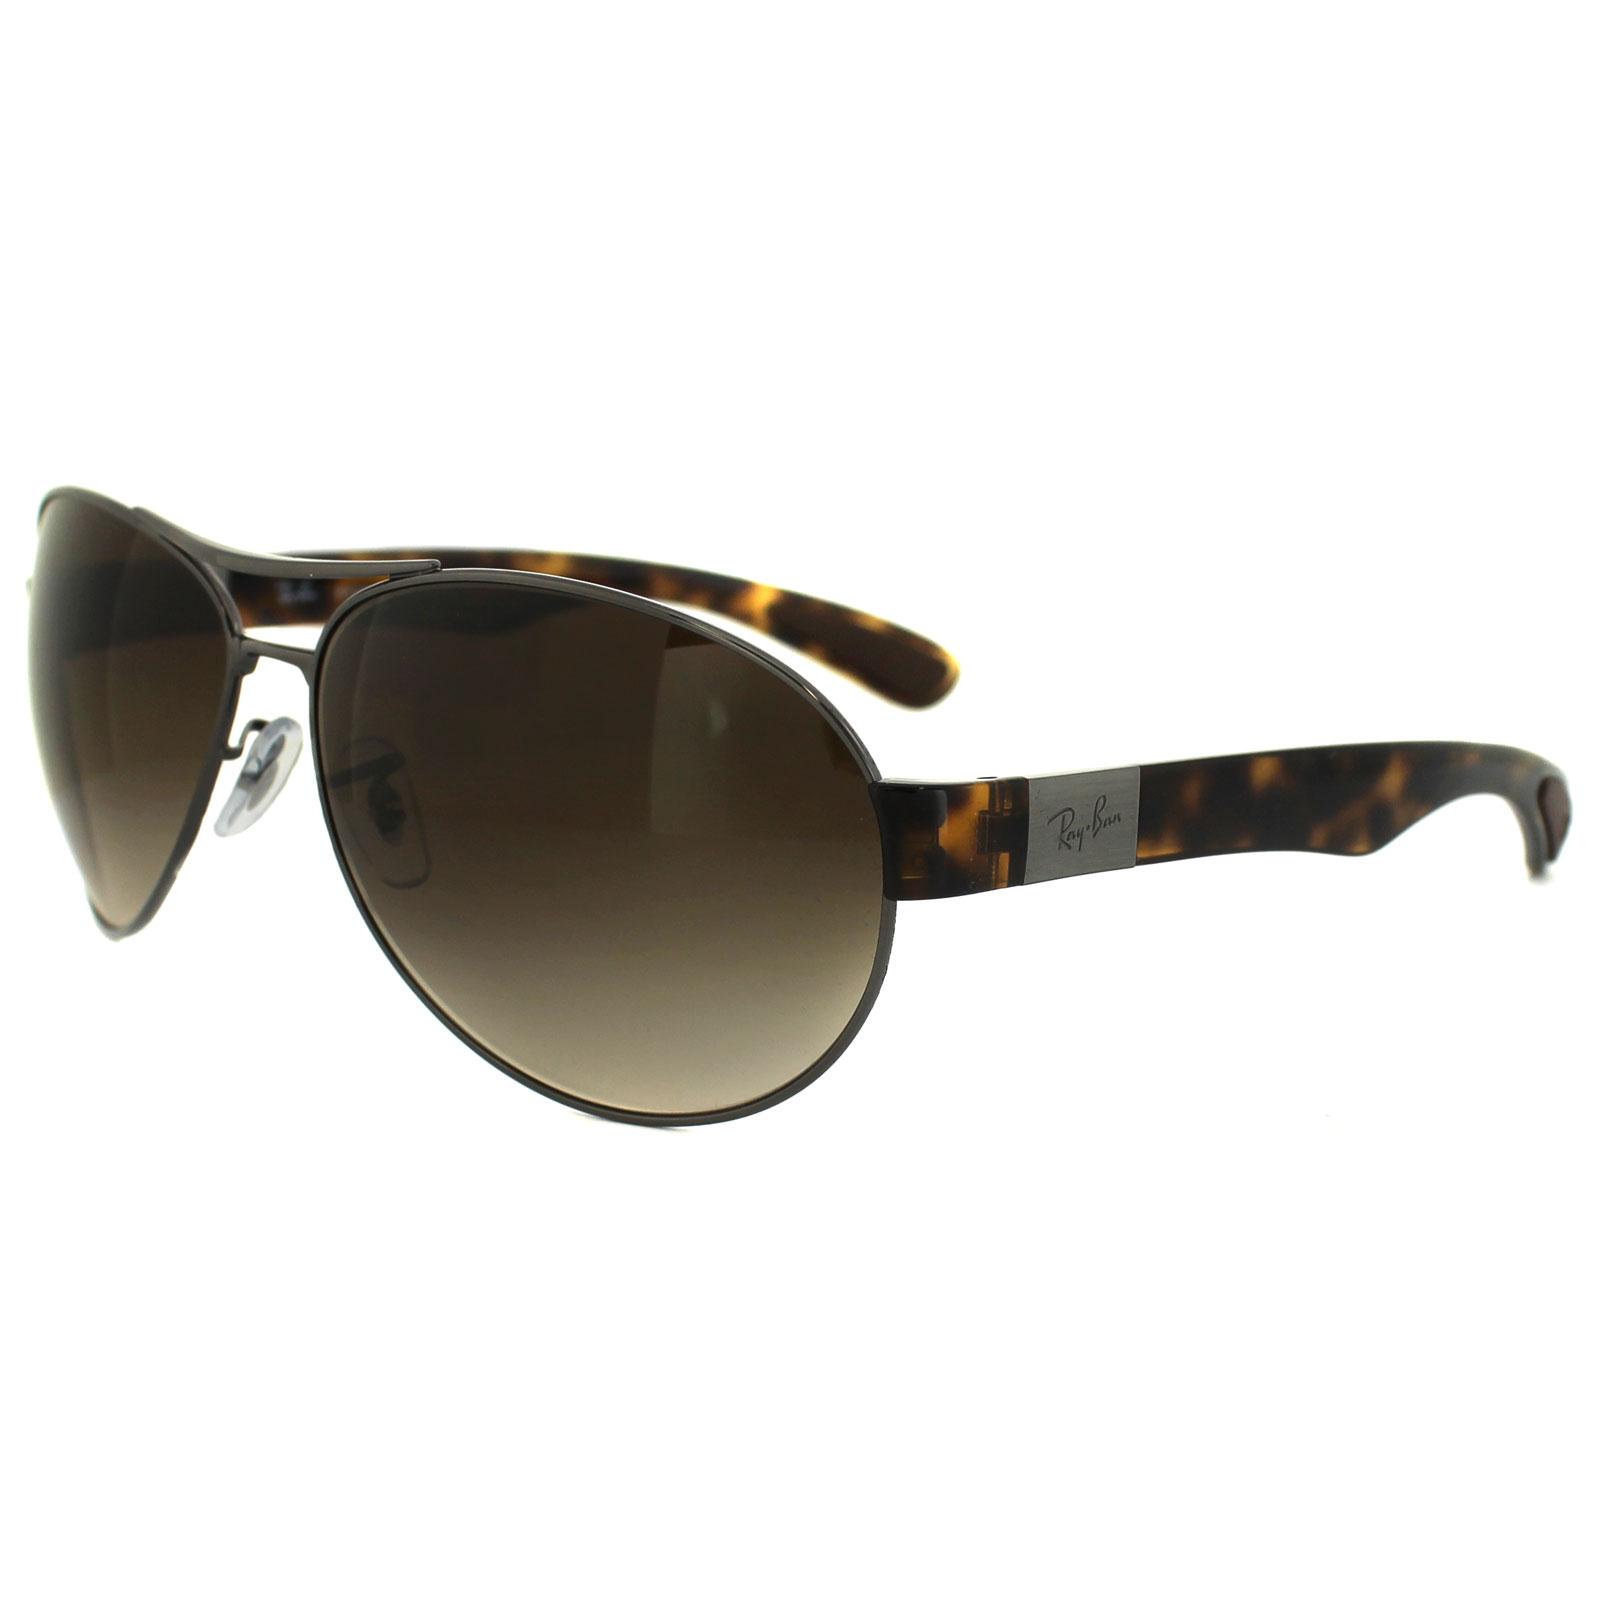 e0fa4de0ca7 Ray Ban Metal Wrap Sunglasses Tortoise Brown